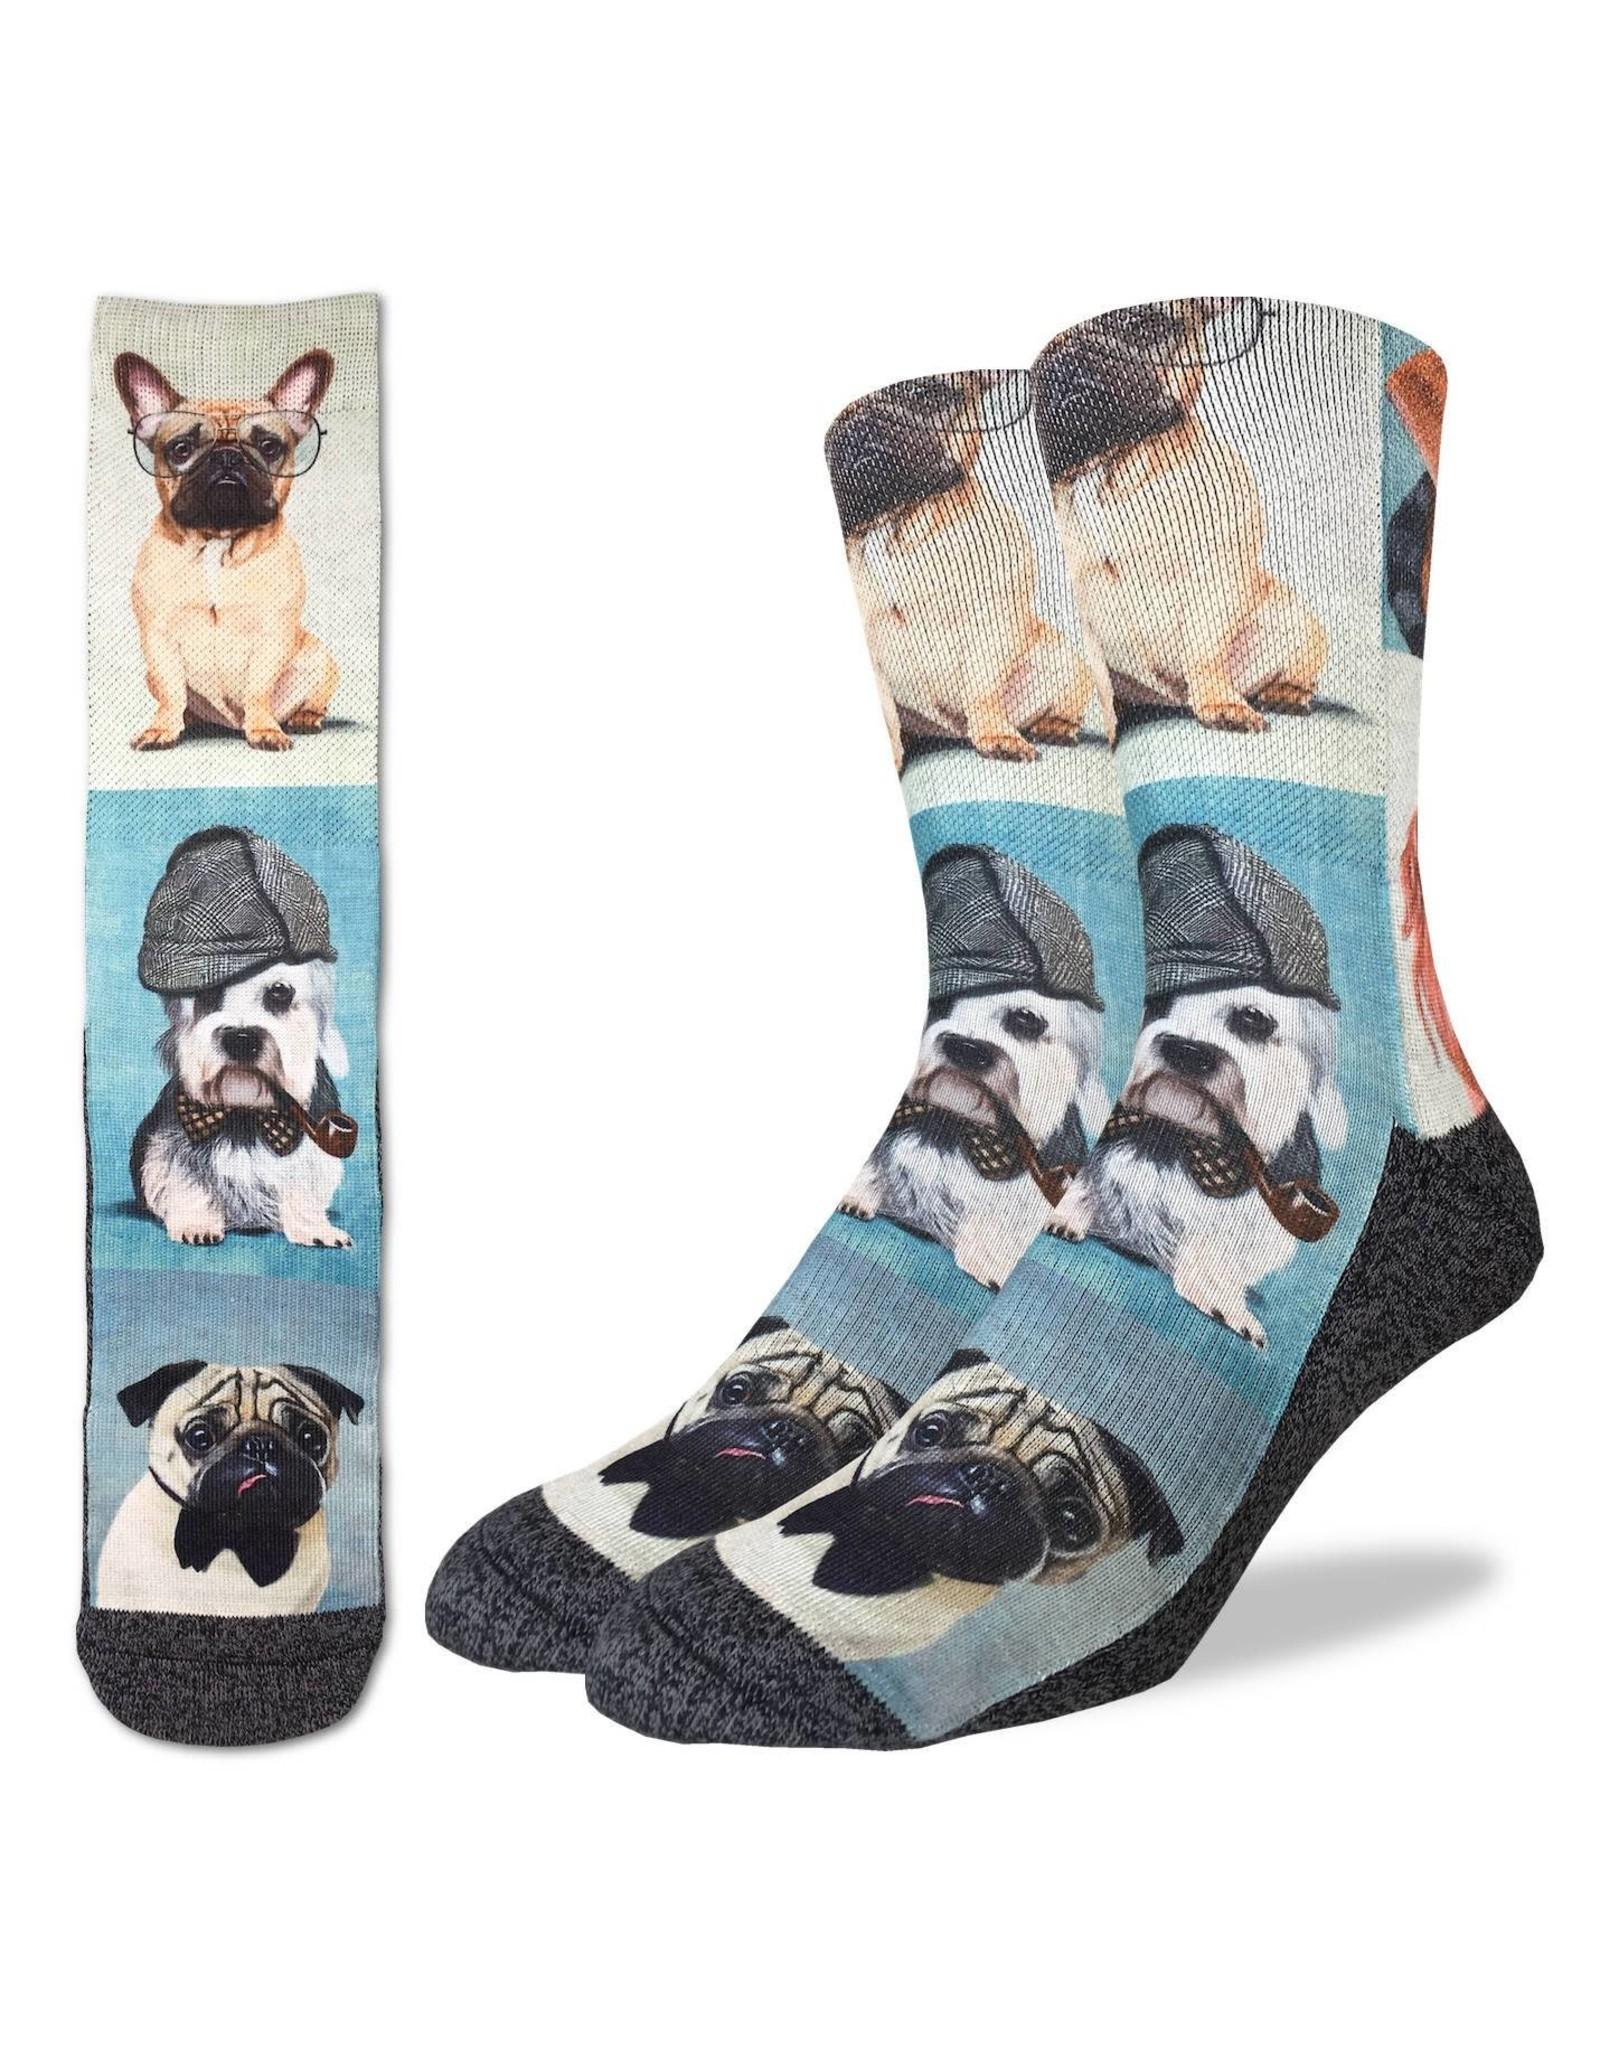 Good Luck Sock Dashing Dogs Socks, 8-13